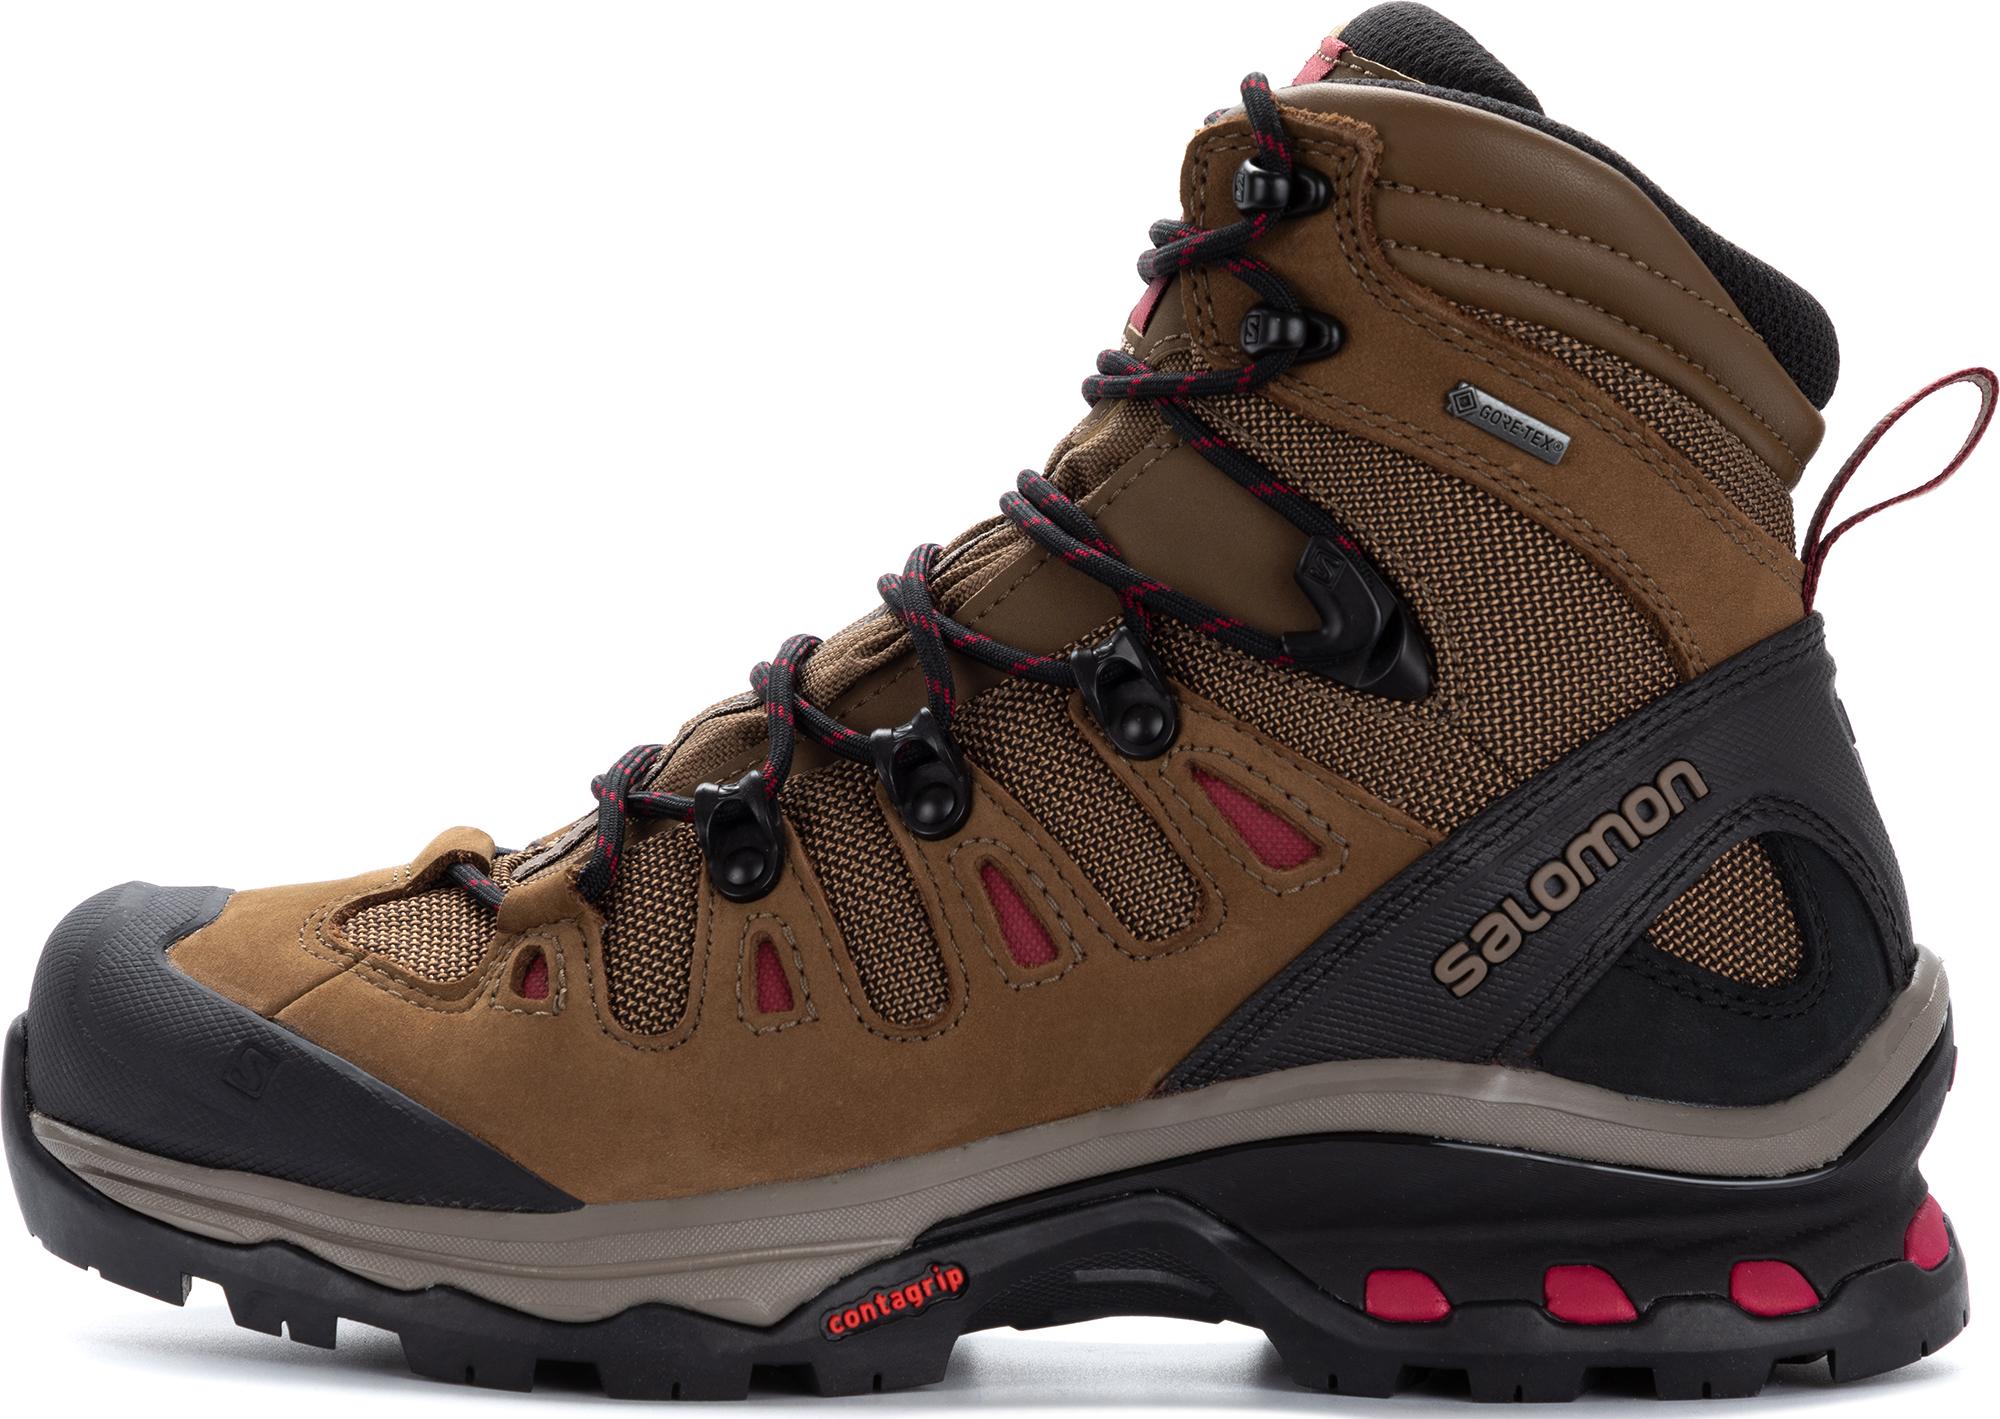 Salomon Ботинки женские Salomon Quest 4D 3 Gtx, размер 40 ботинки женские daze цвет темно серый 16507z 3 2l размер 36